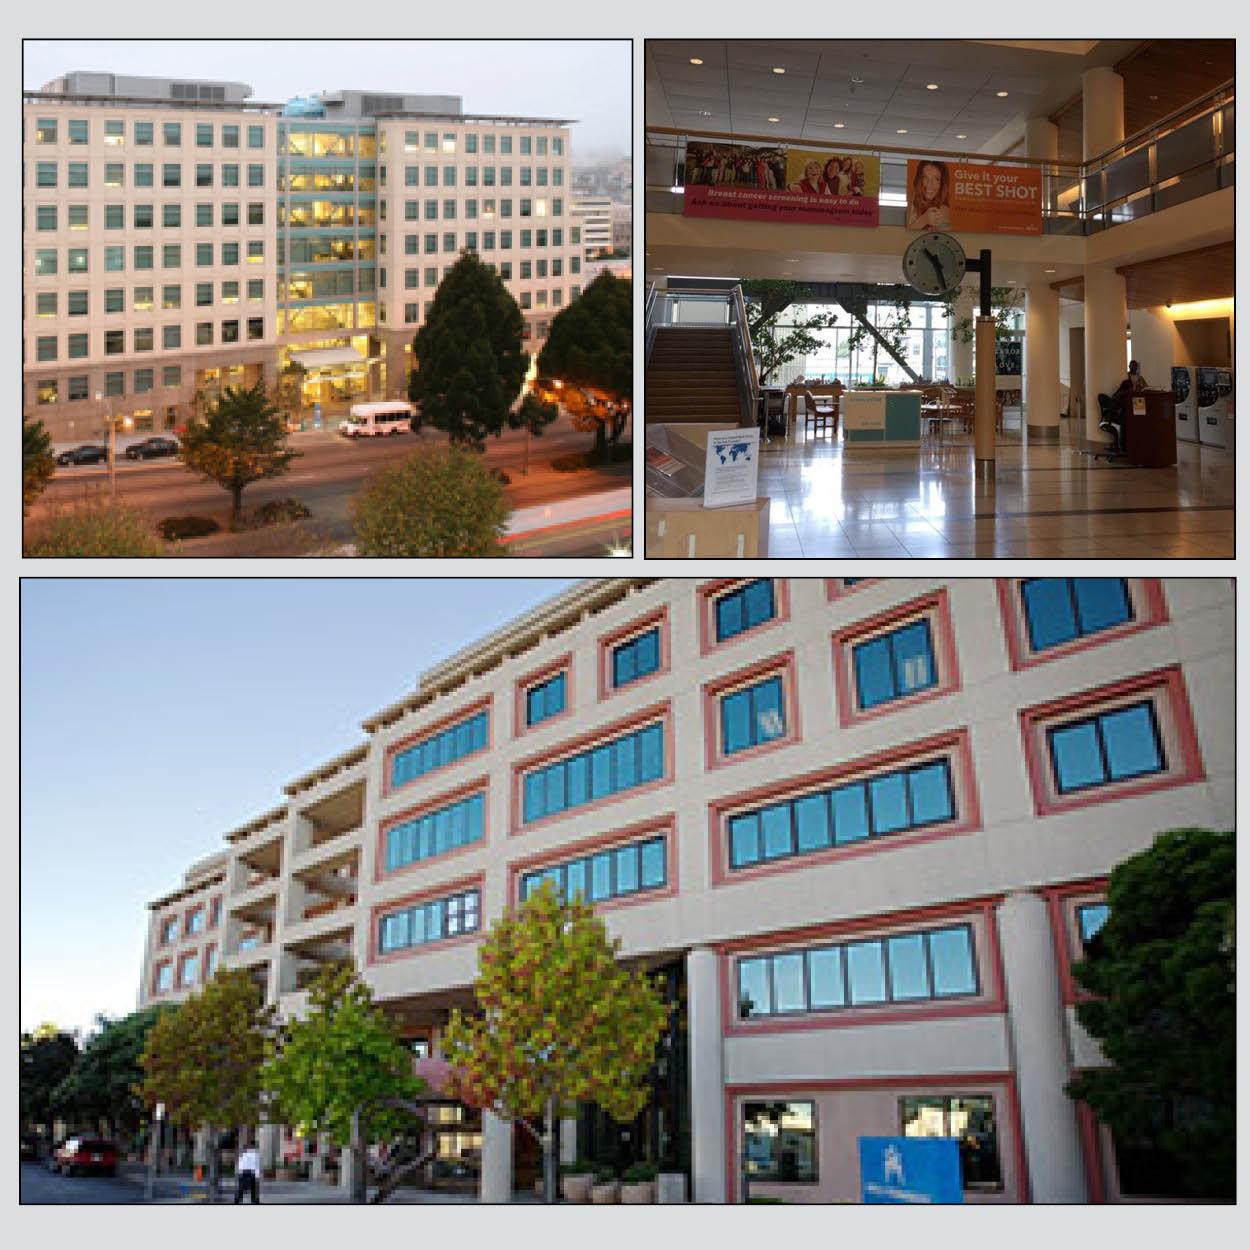 Kaiser Permanente San Francisco Medical Center 100 Hospitals With Great Heart Programs 2015 16